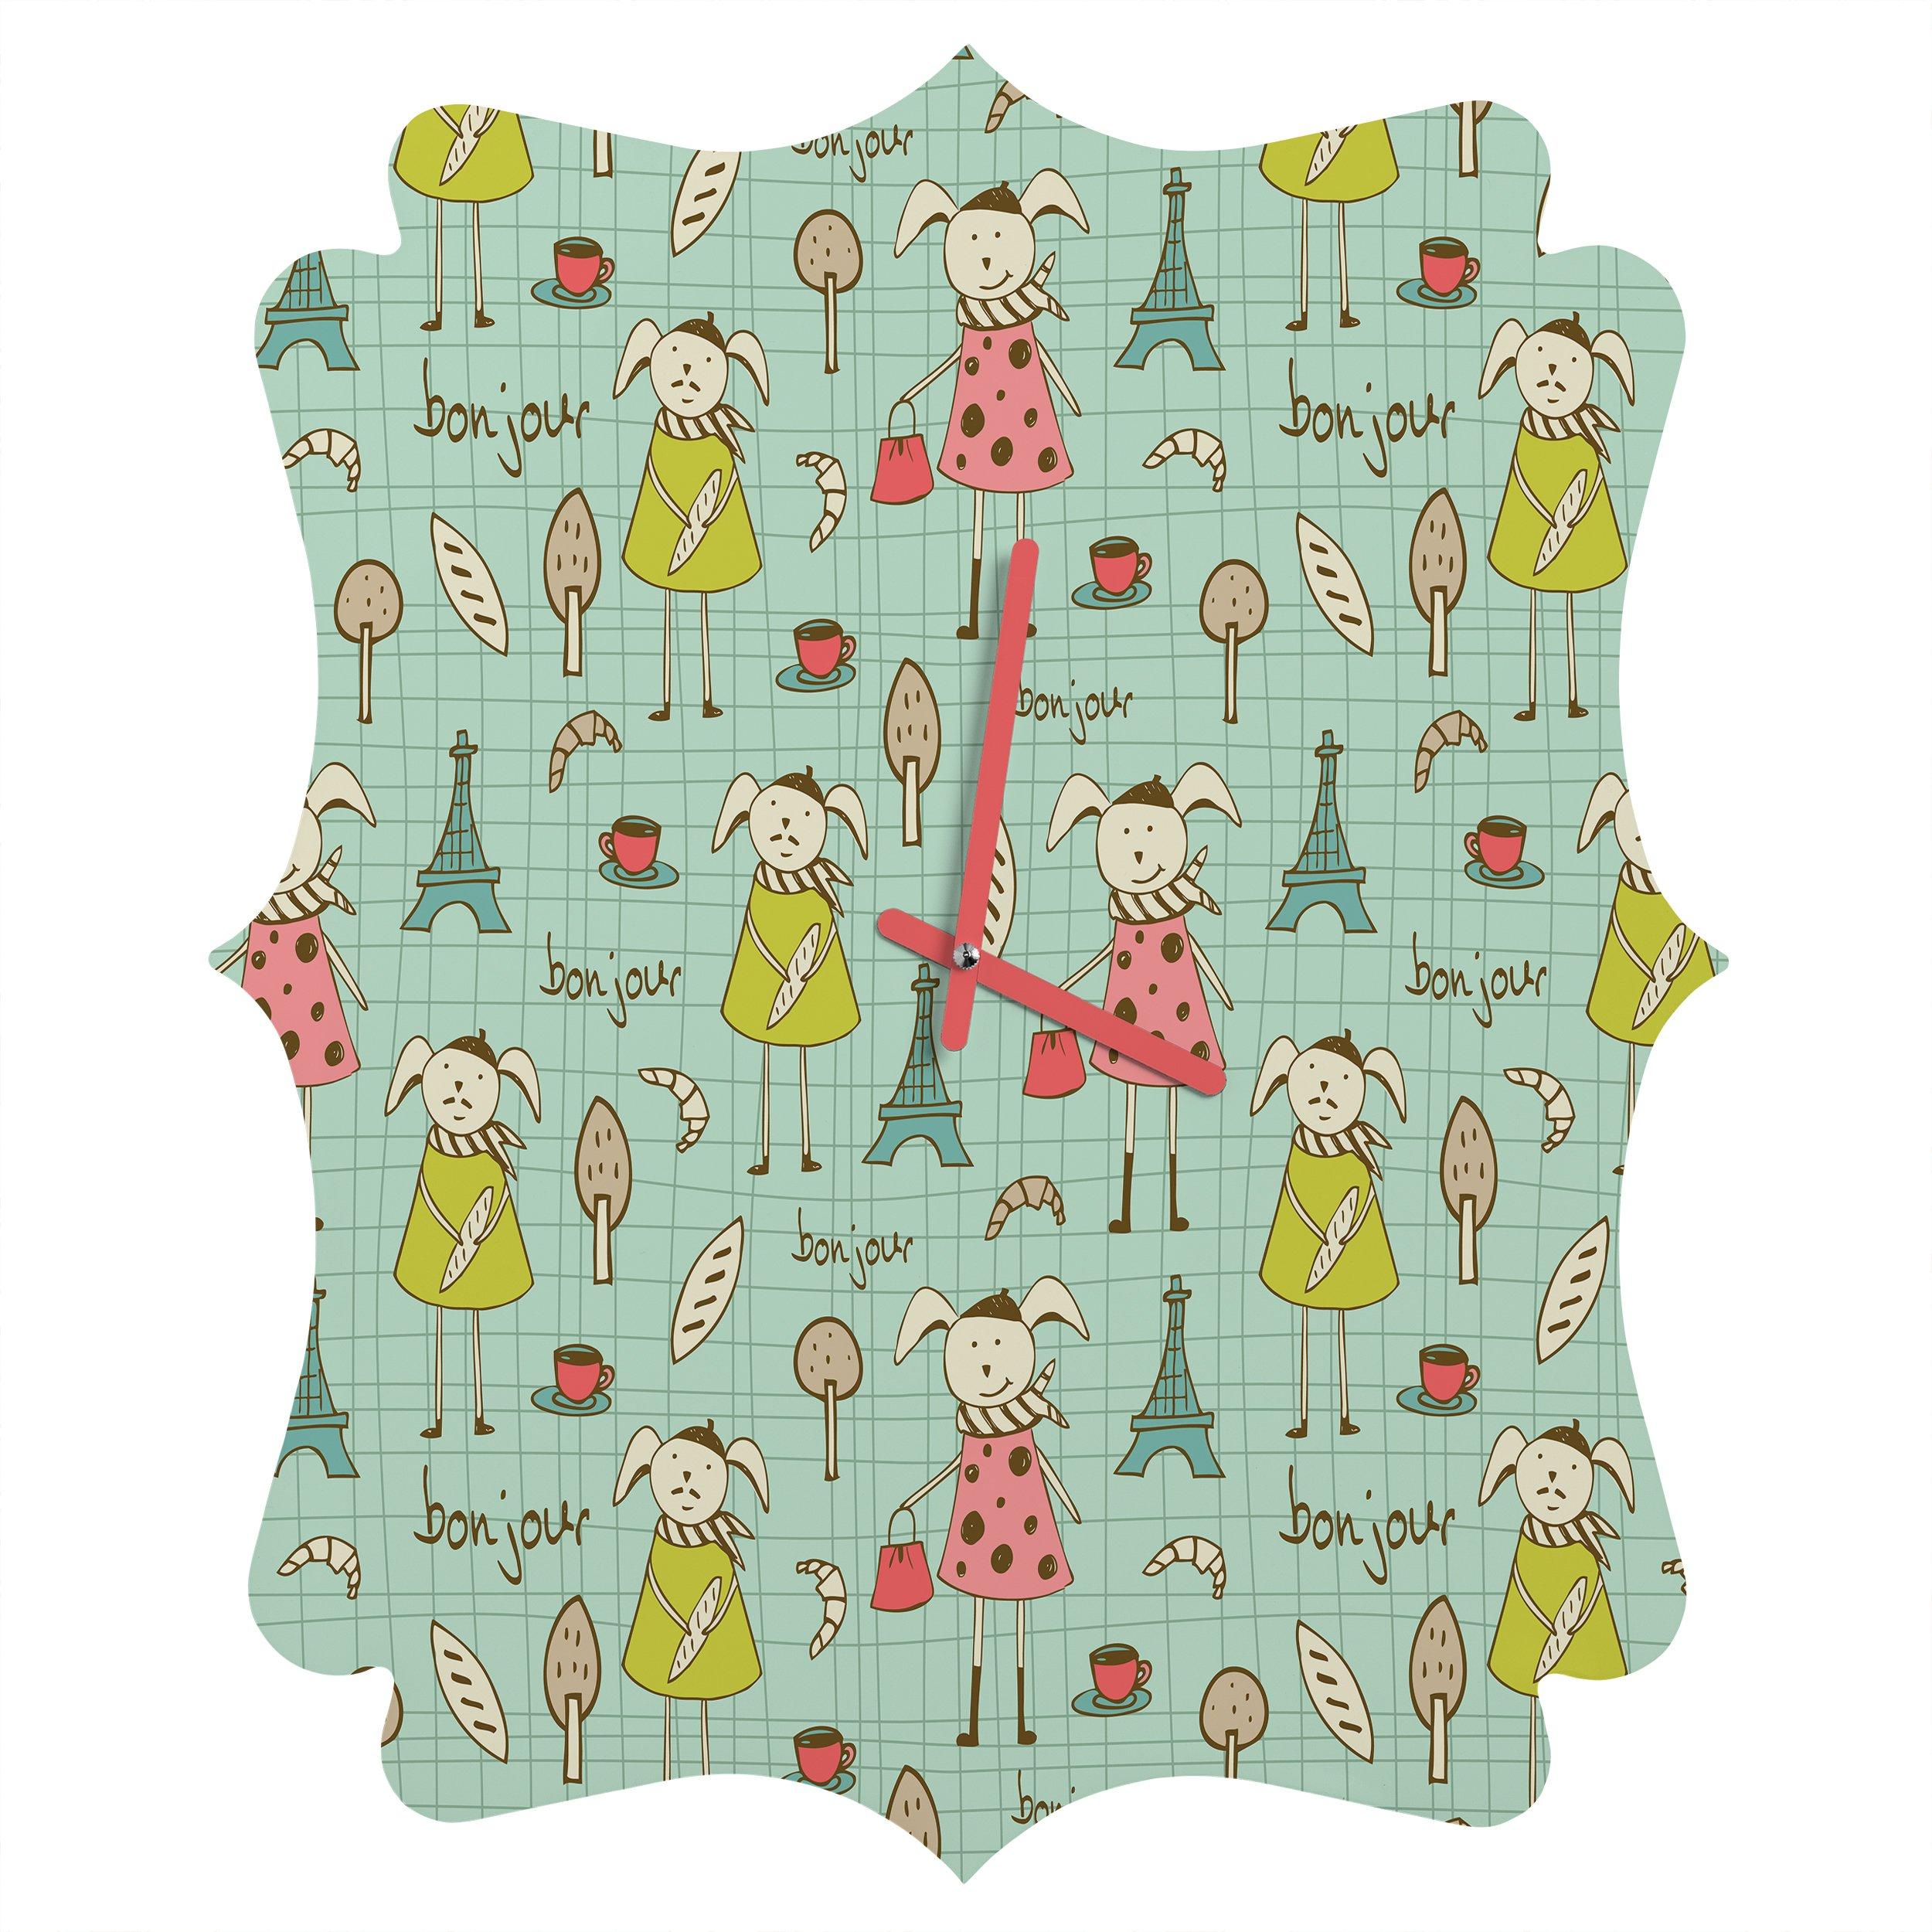 Deny Designs Heather Dutton, Bonjour Lapin, Quatrefoil Clock, Medium